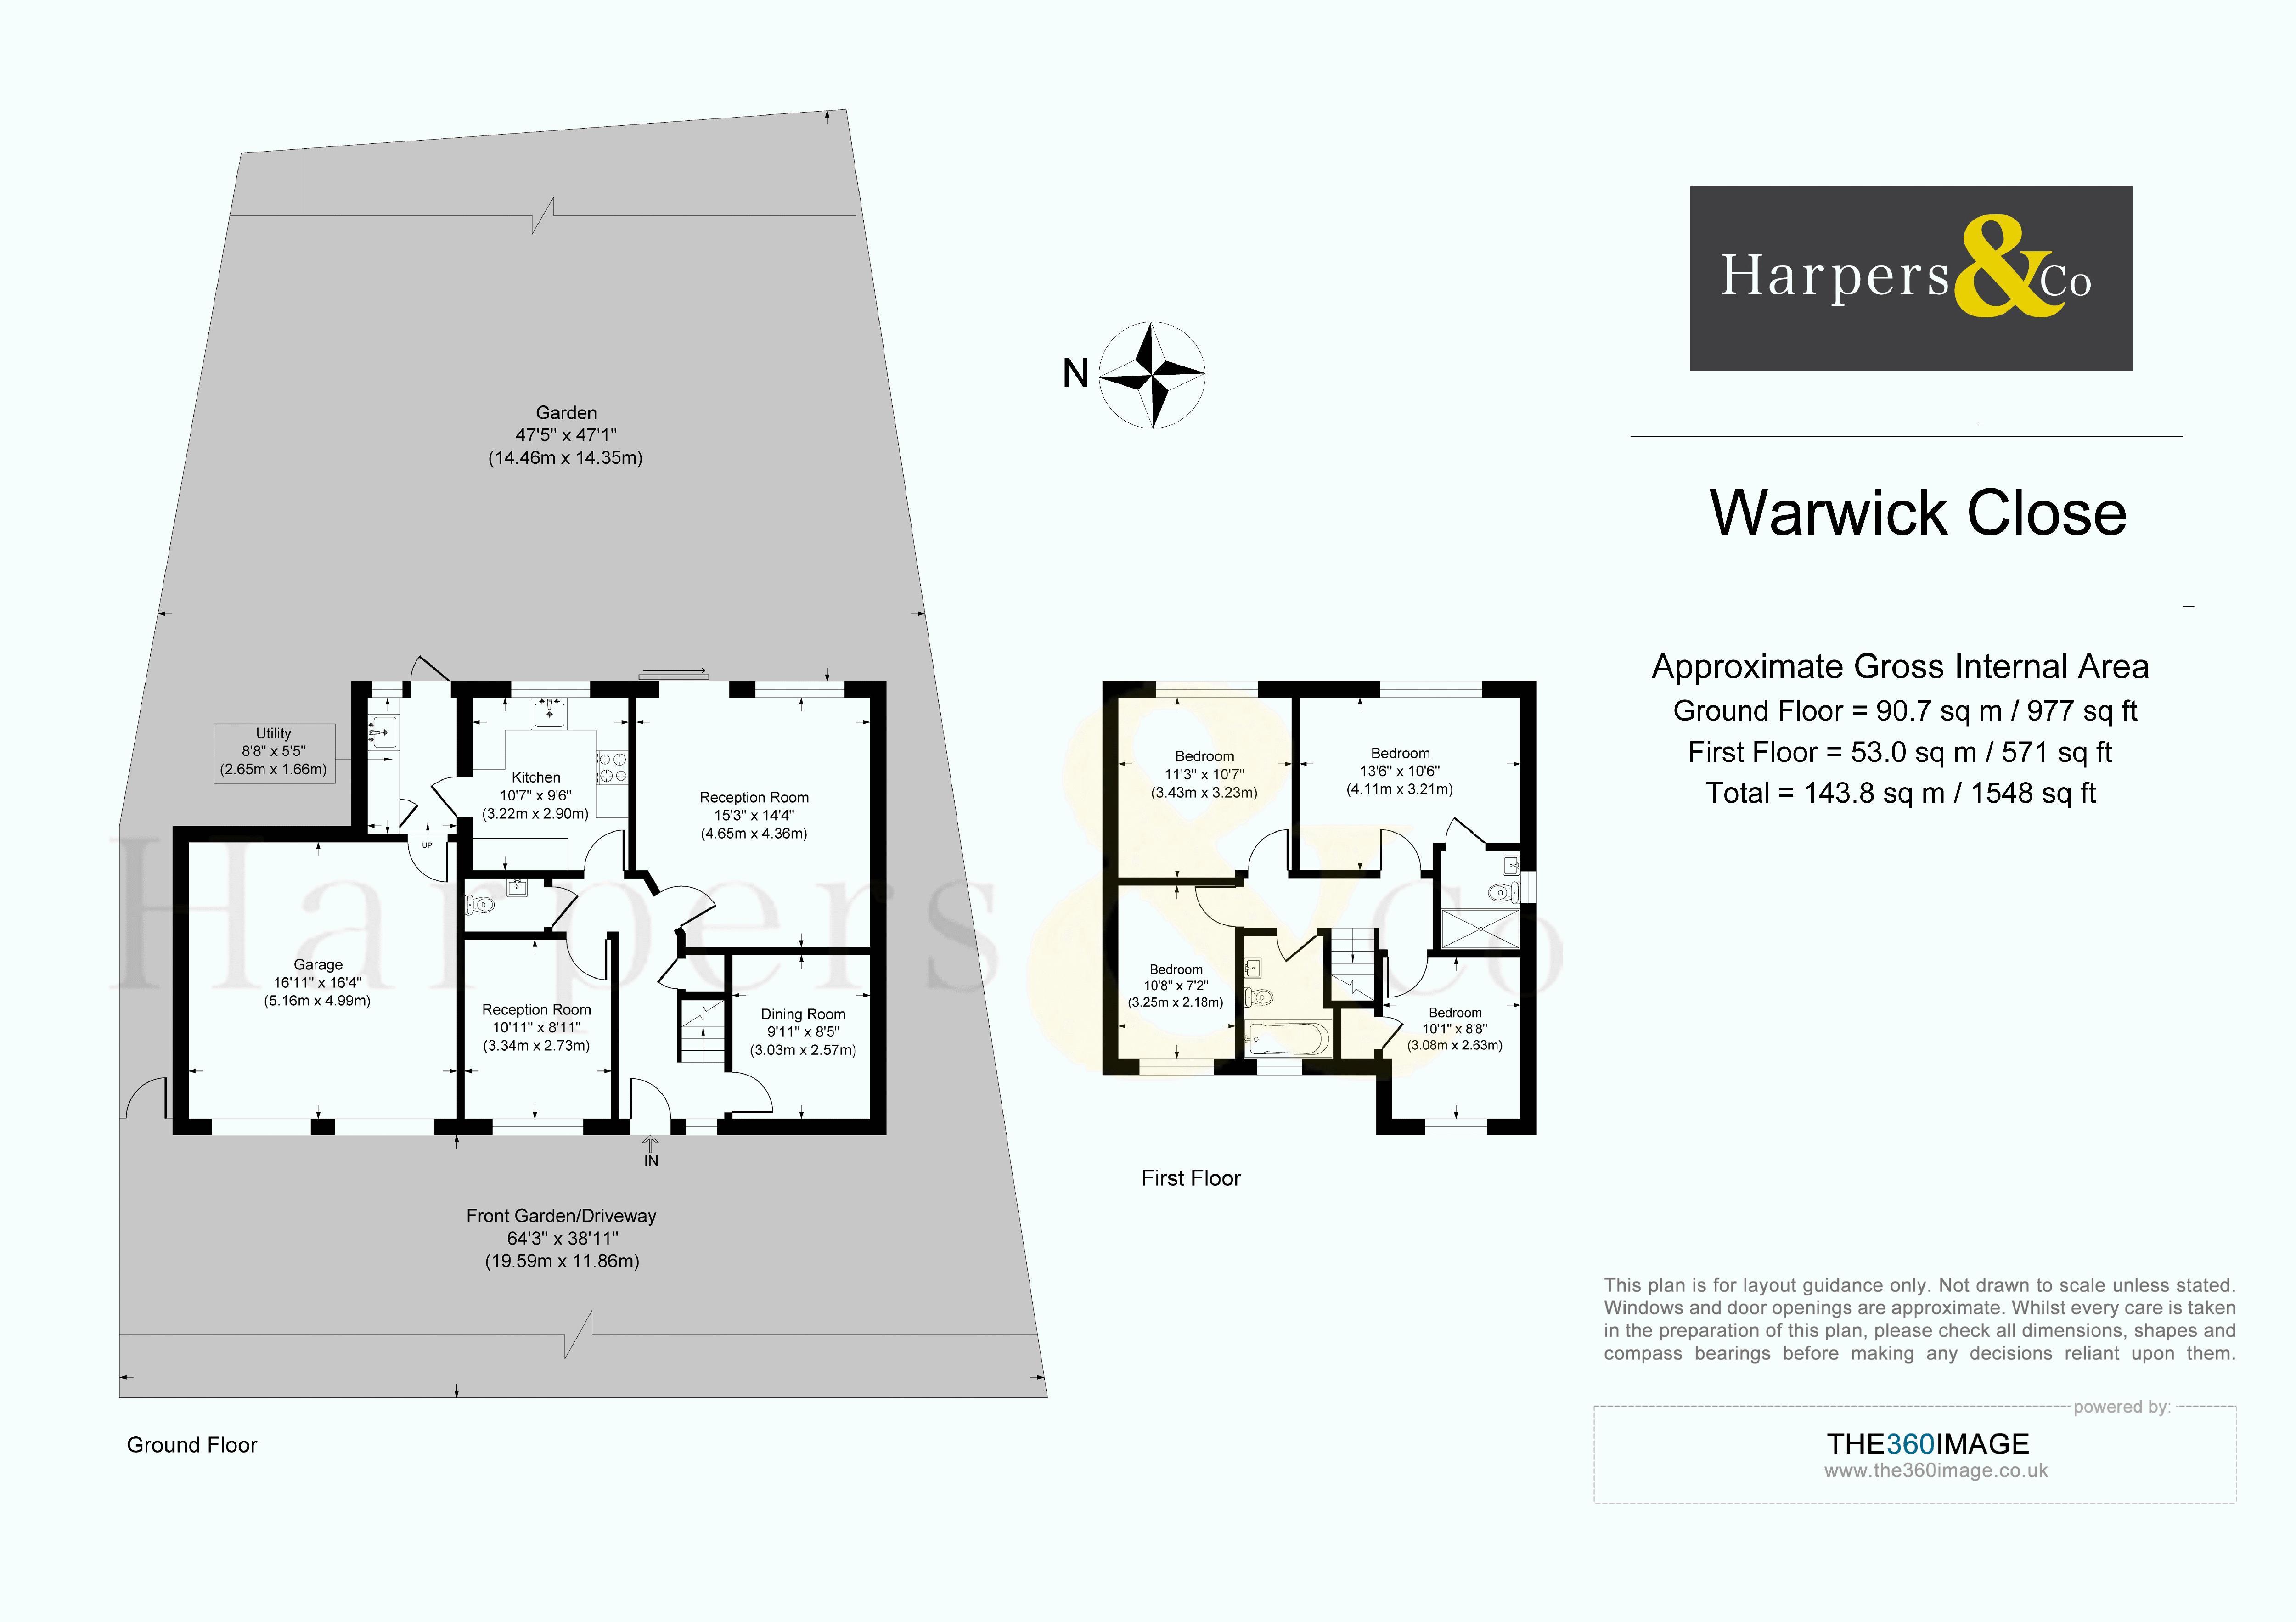 Warwick Close